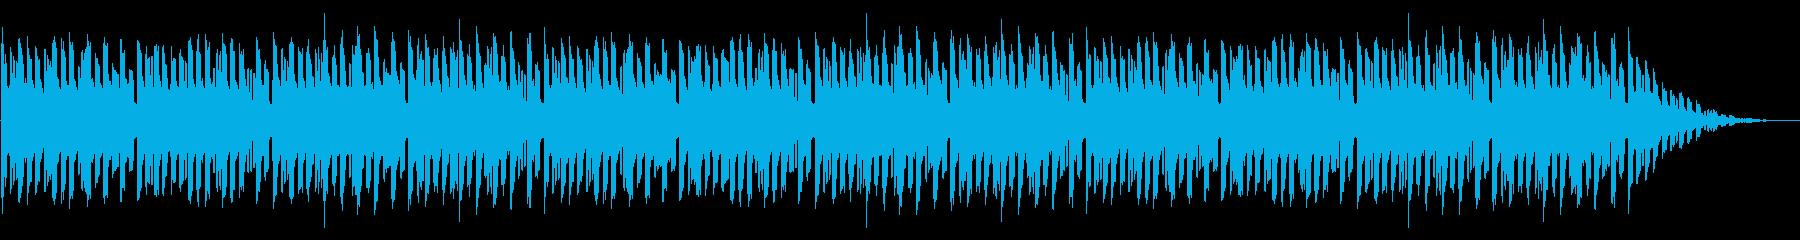 GB風RPGのOP曲の再生済みの波形